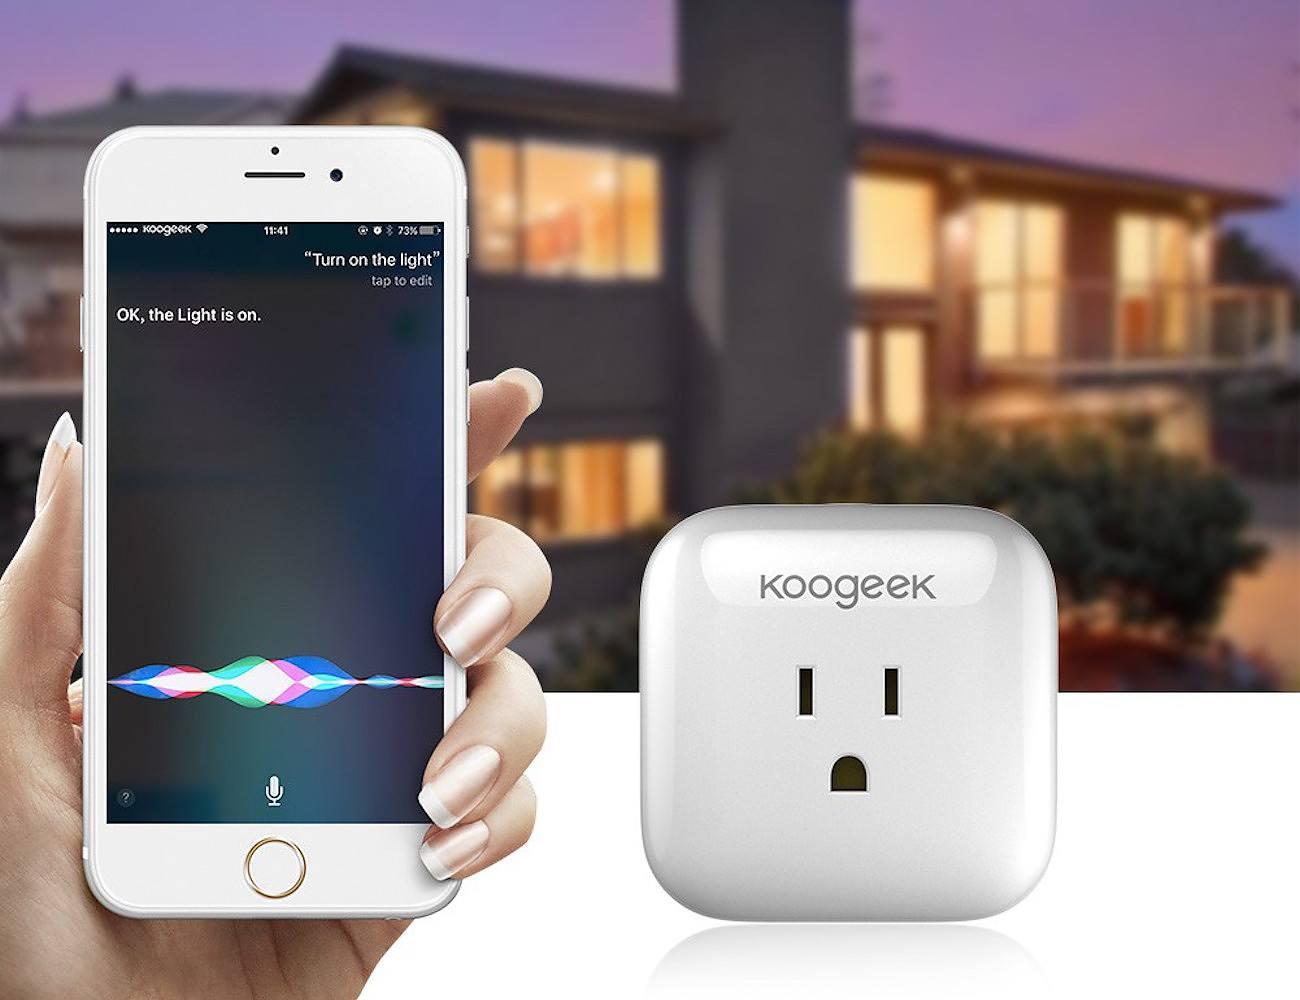 Koogeek Wi-Fi Smart Plug